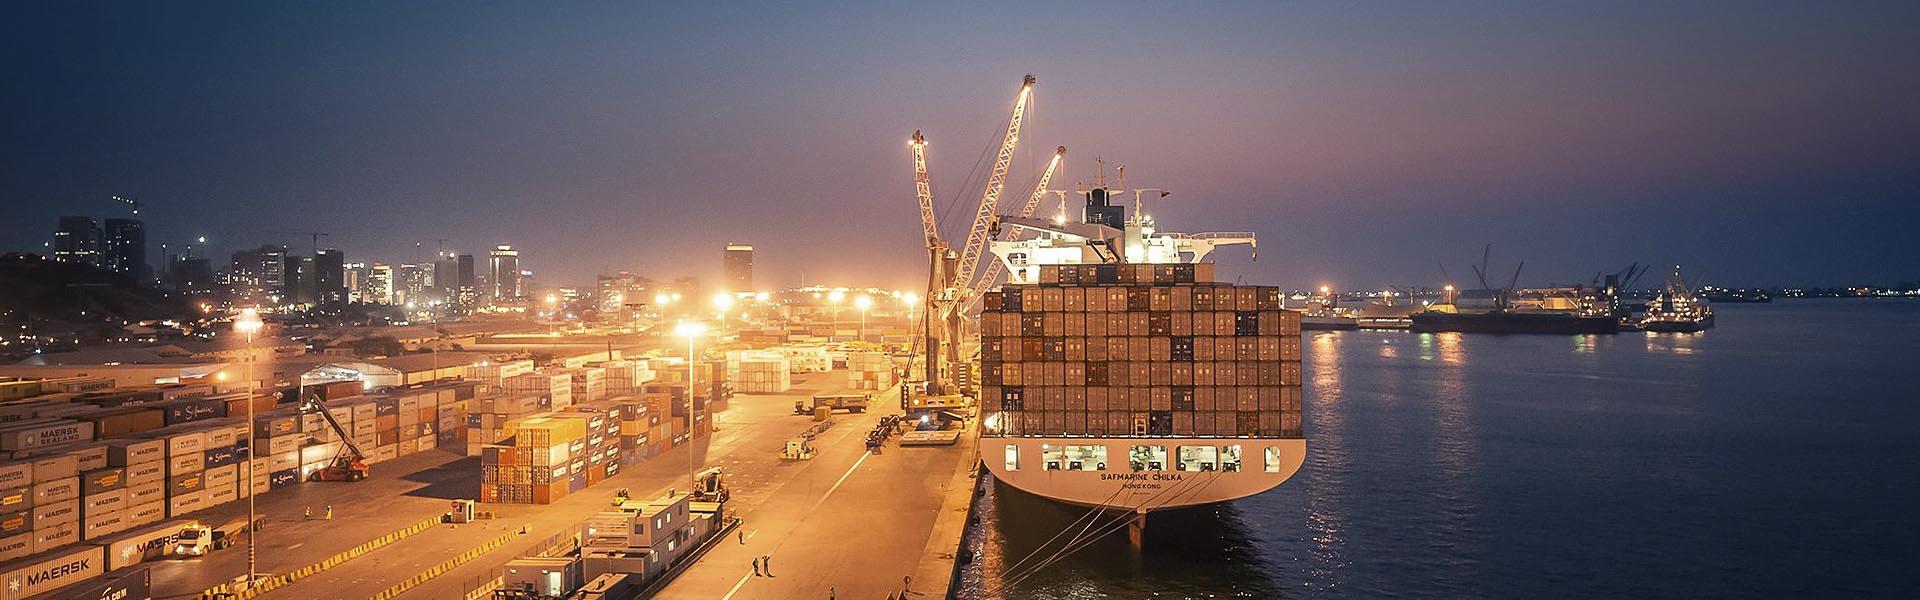 Porto de Luanda: 75 anos a ligar Angola aos mercados internacionais